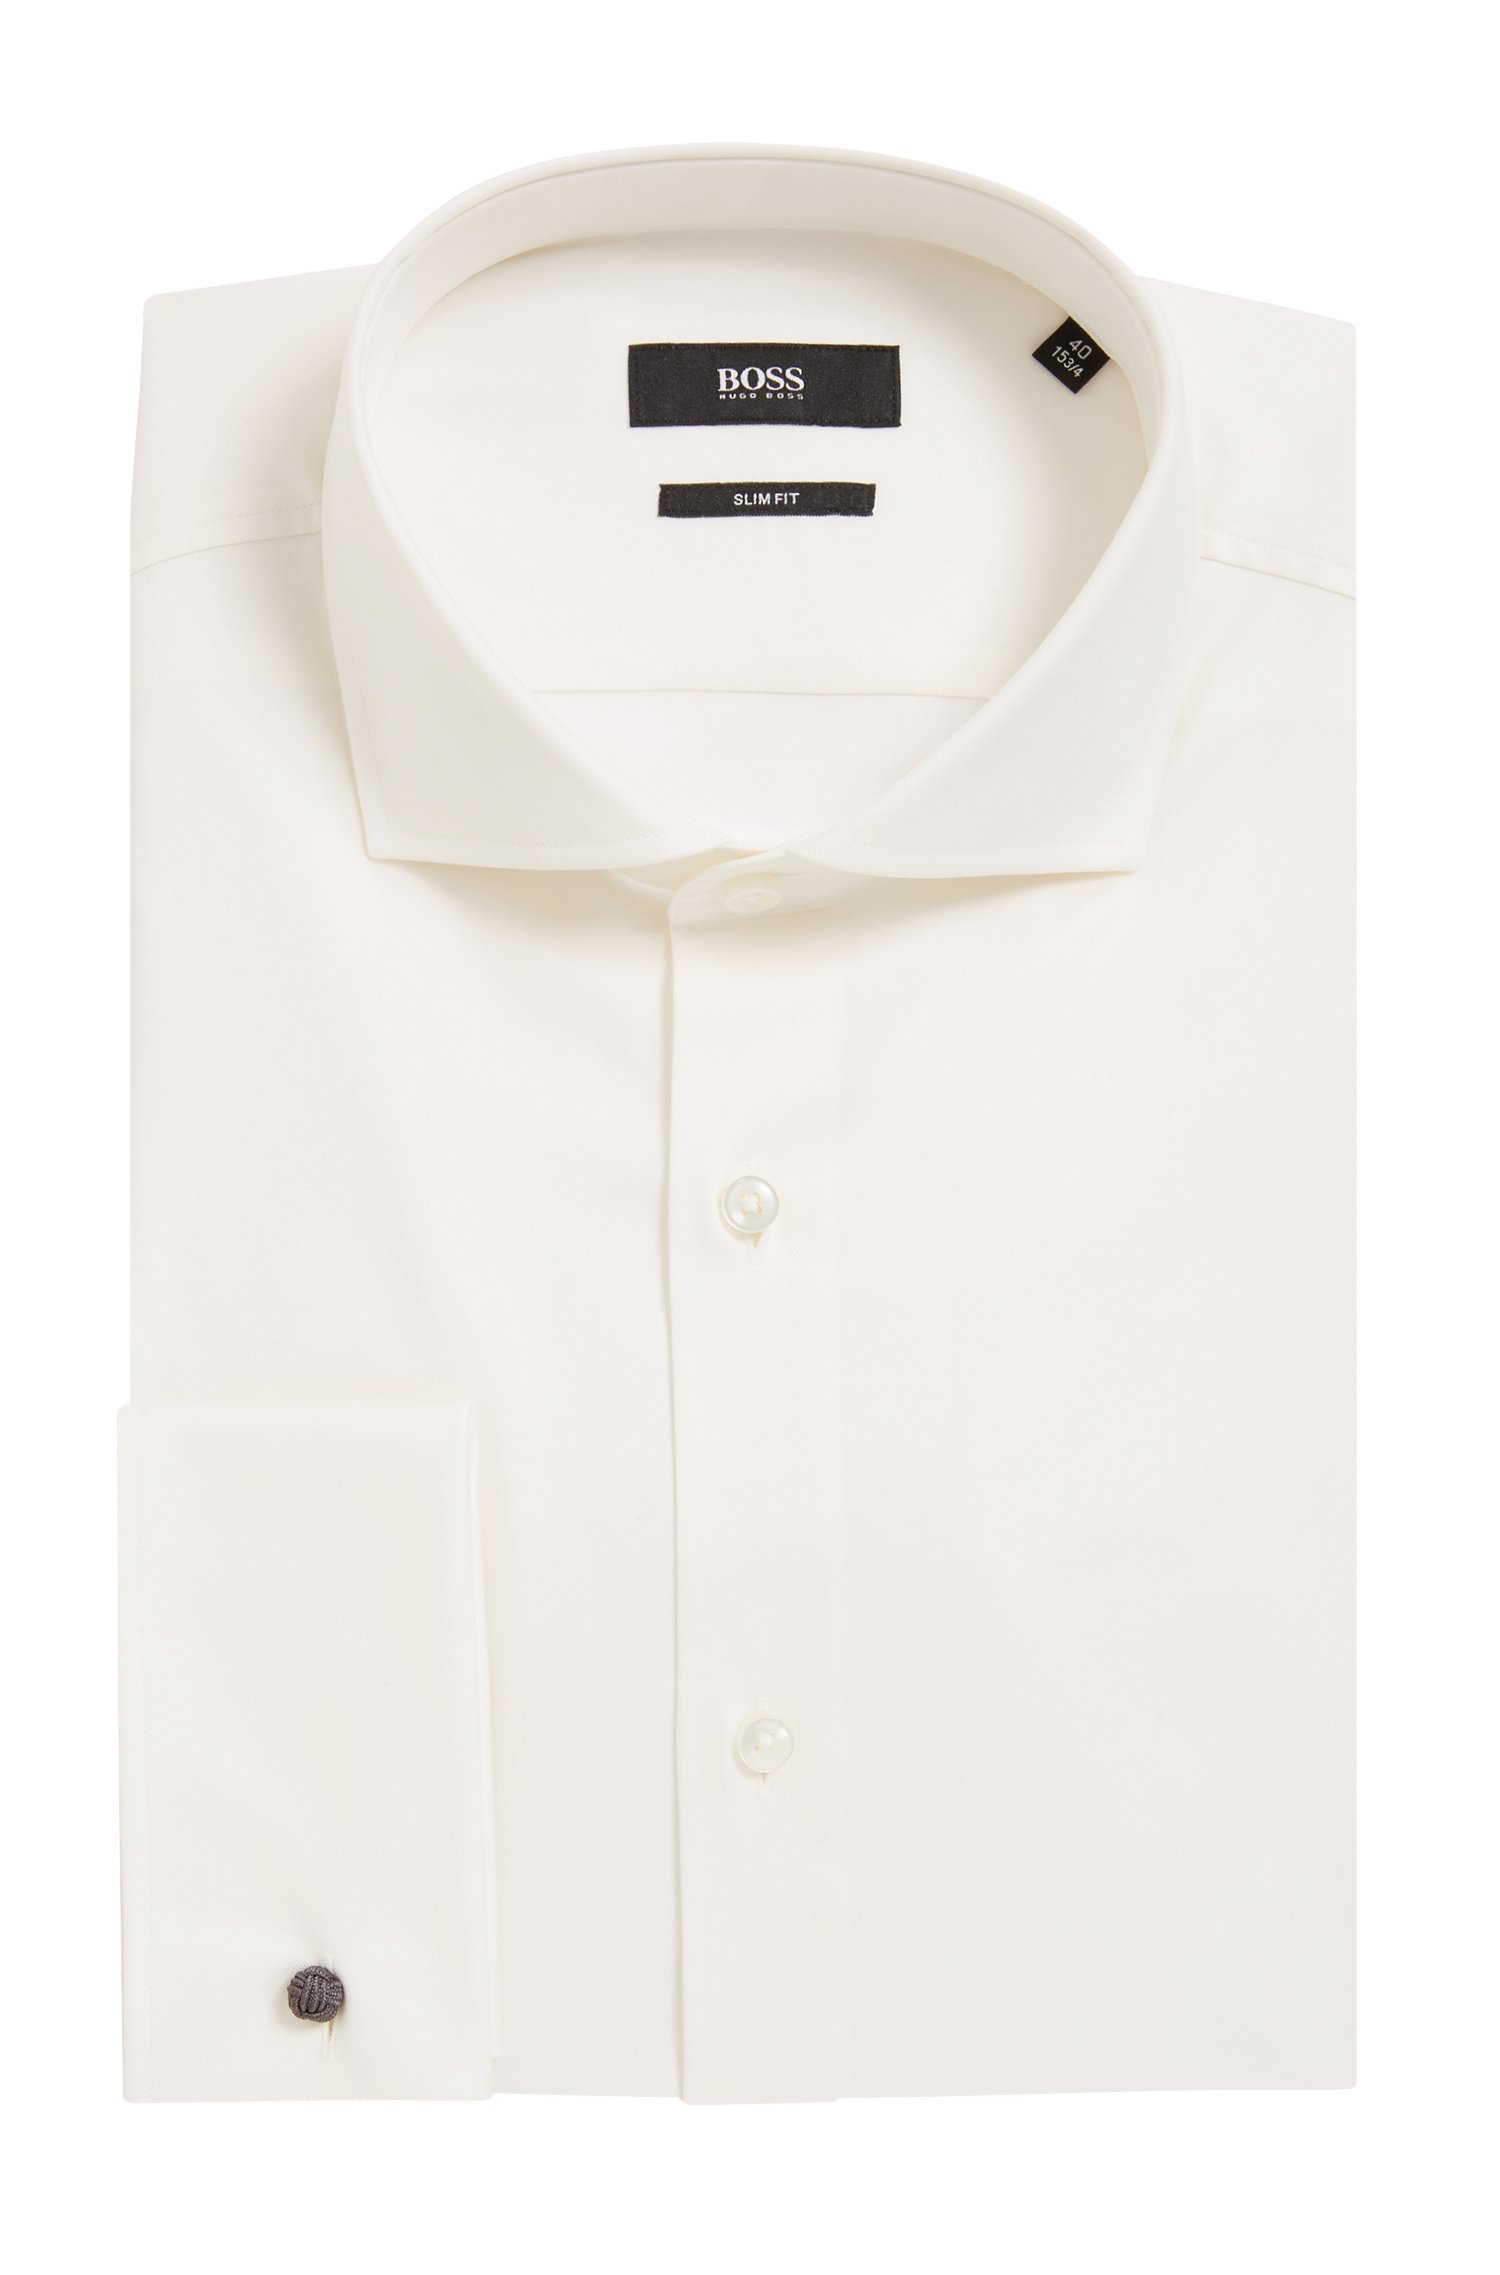 Piet Zoomers, Boss Black dress shirt